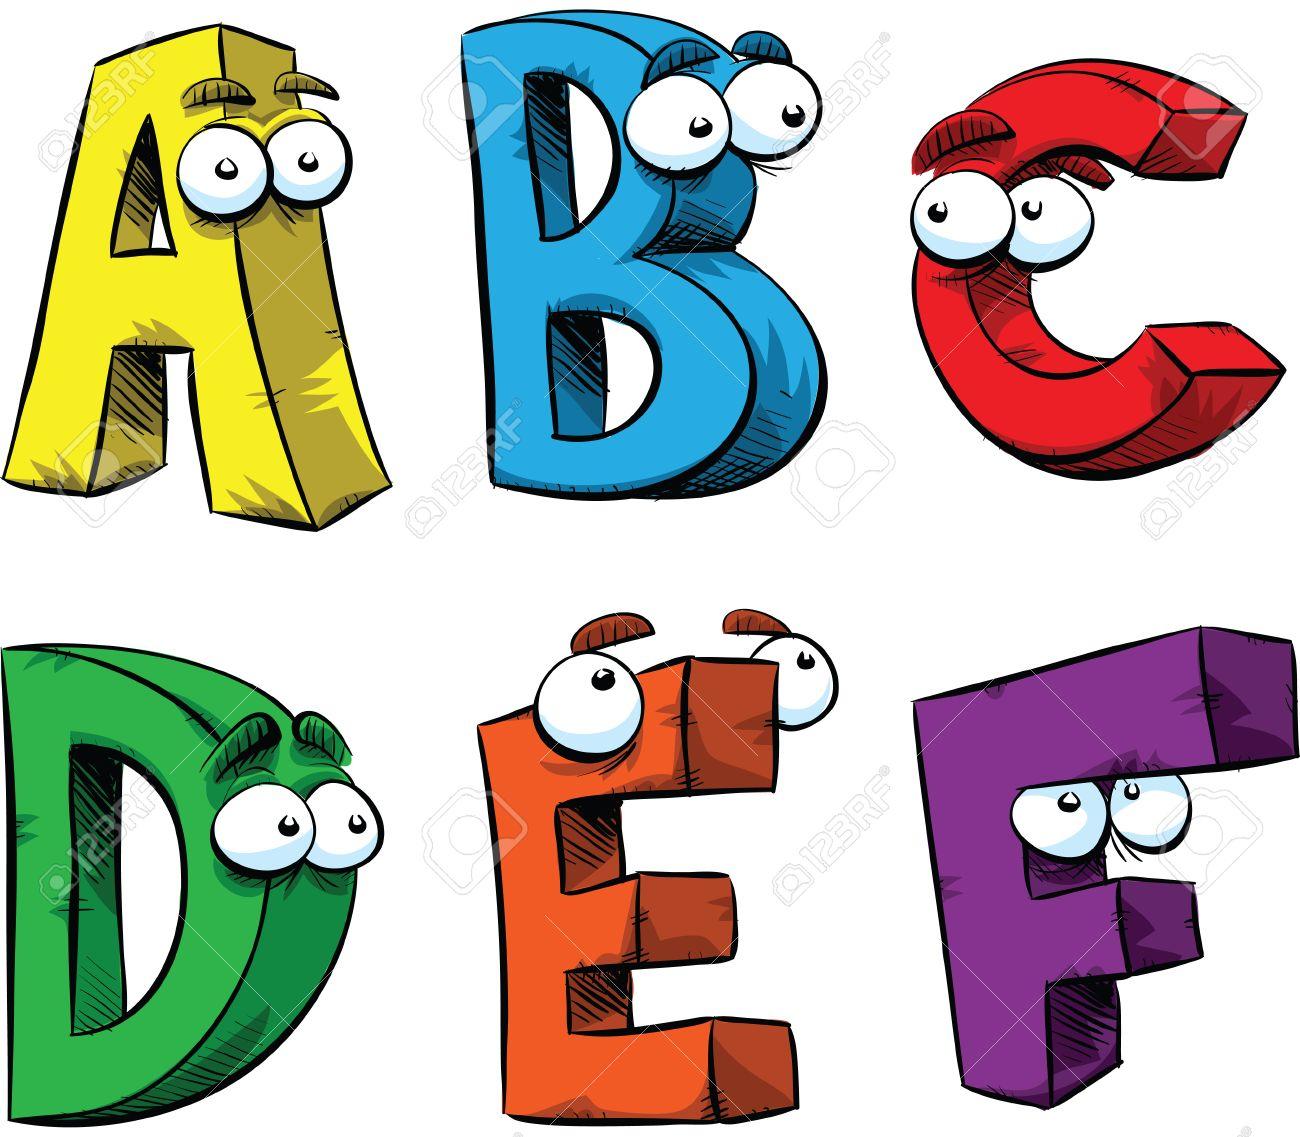 Sunete, silabe, cuvinte, propoziții